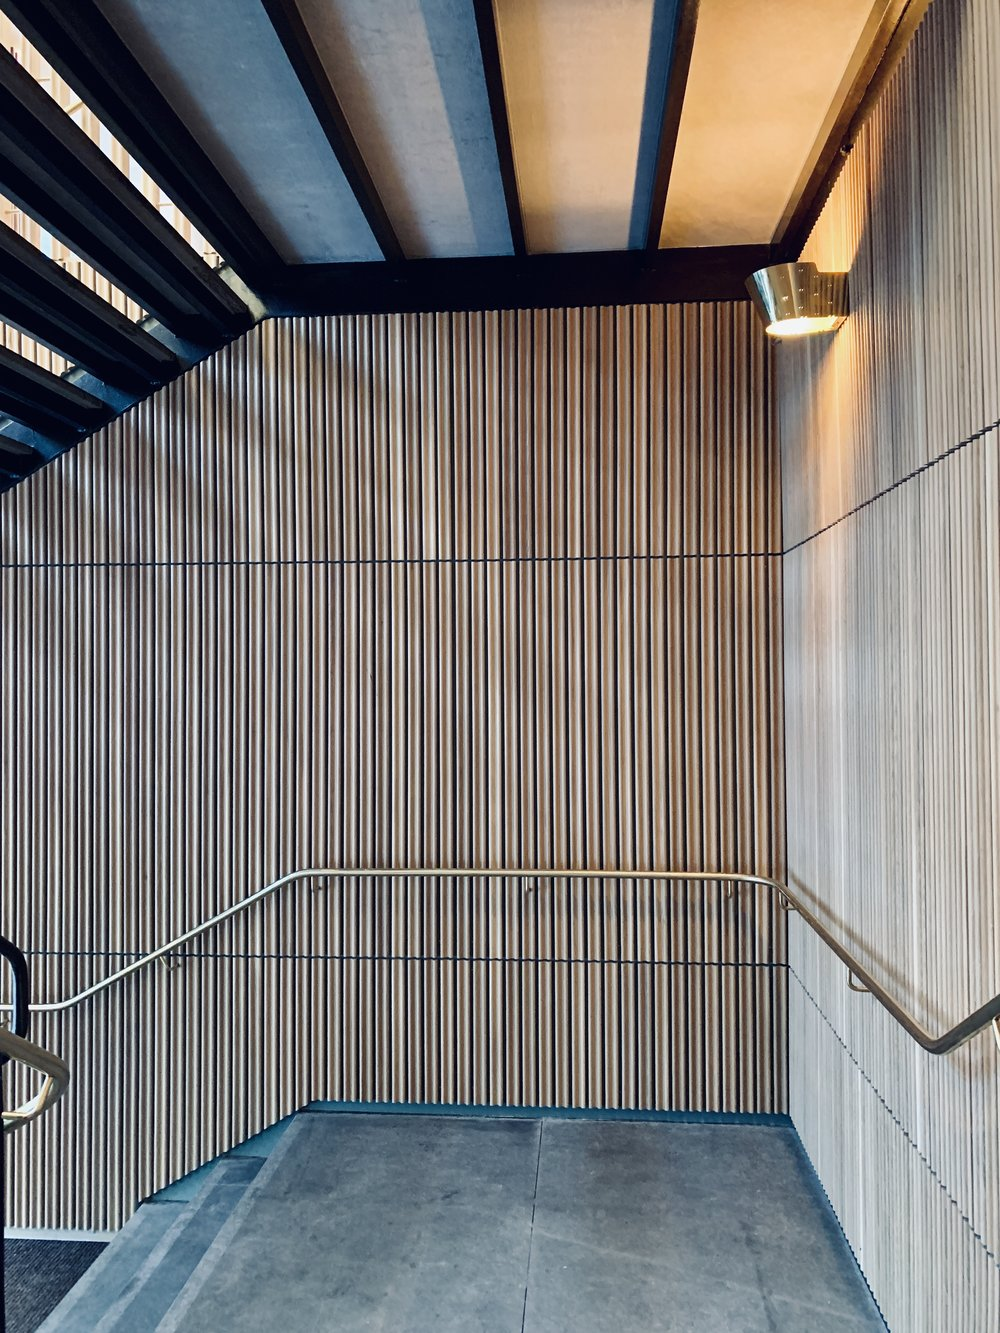 Restaurant Tivander architect drawn concrete staircase, brass hand railing and lighting